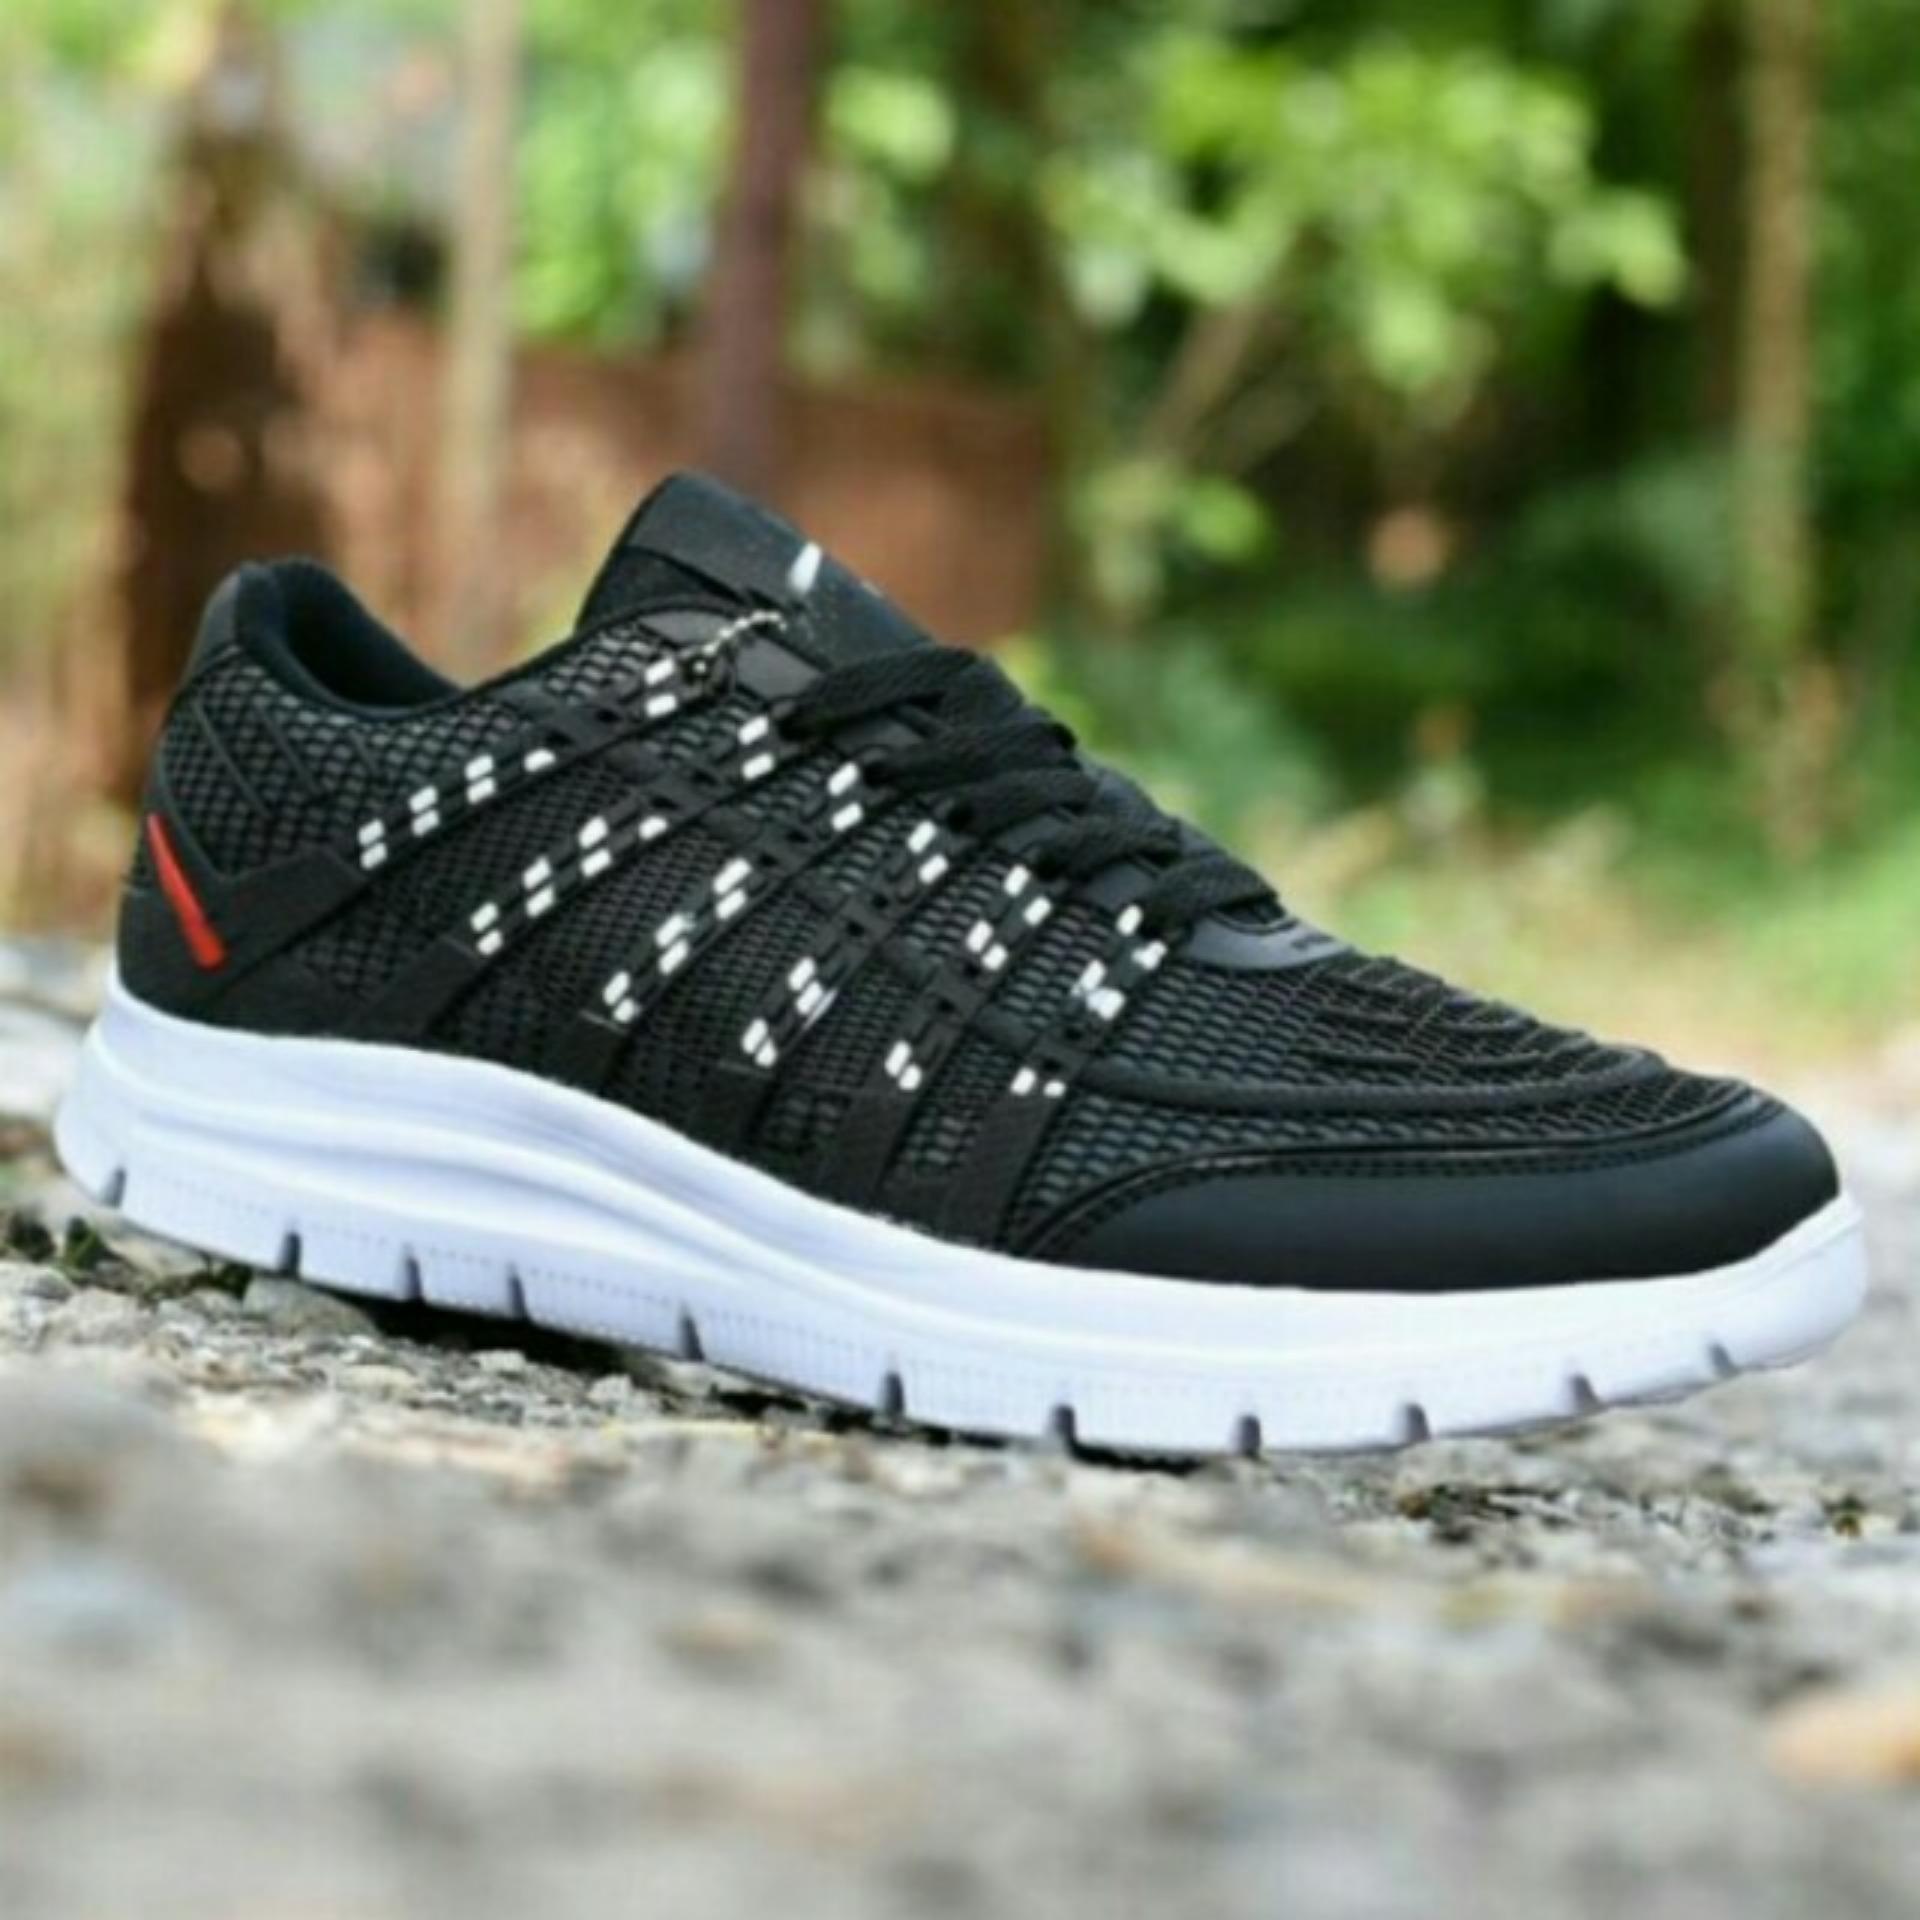 Sepatu Sneakers Sport Kets Pria - Black